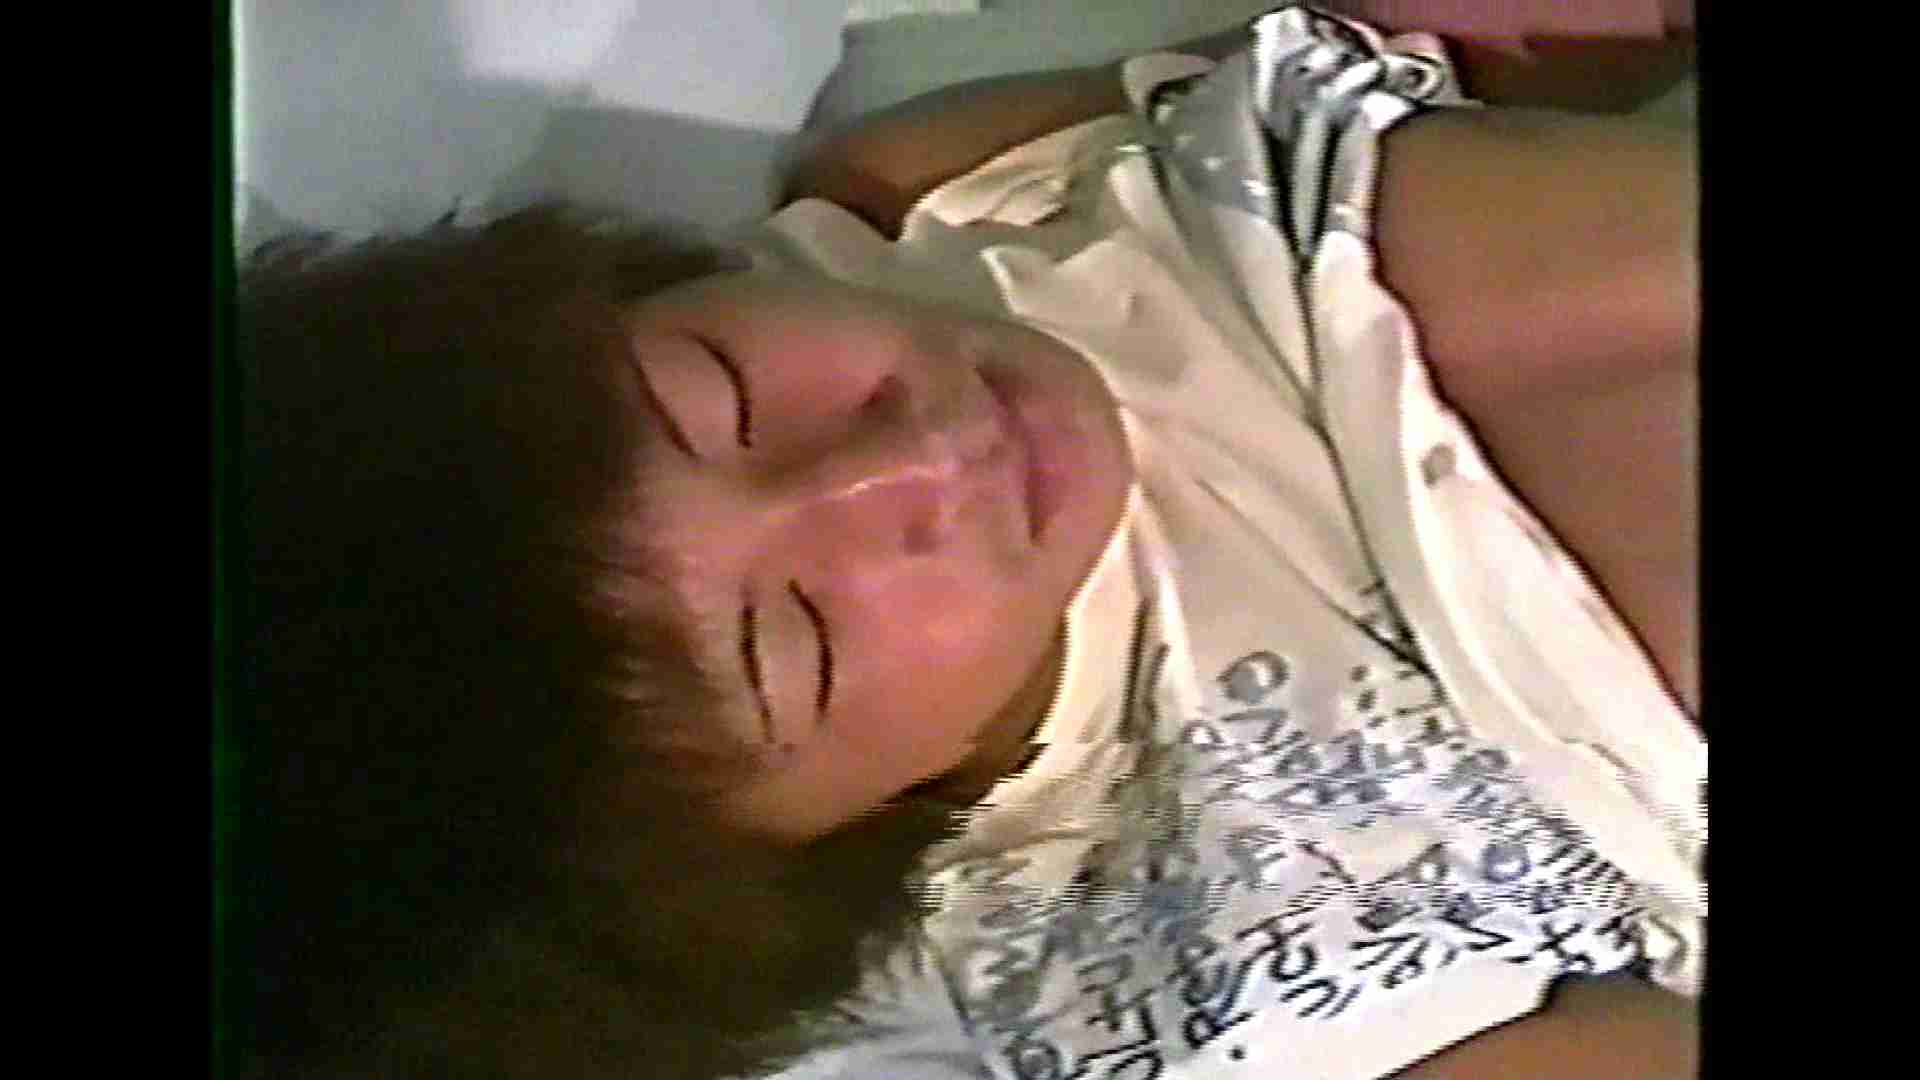 MADOKAさんのズリネタコレクションVol.3-1 名作・話題作 | オムニバス  101pic 18